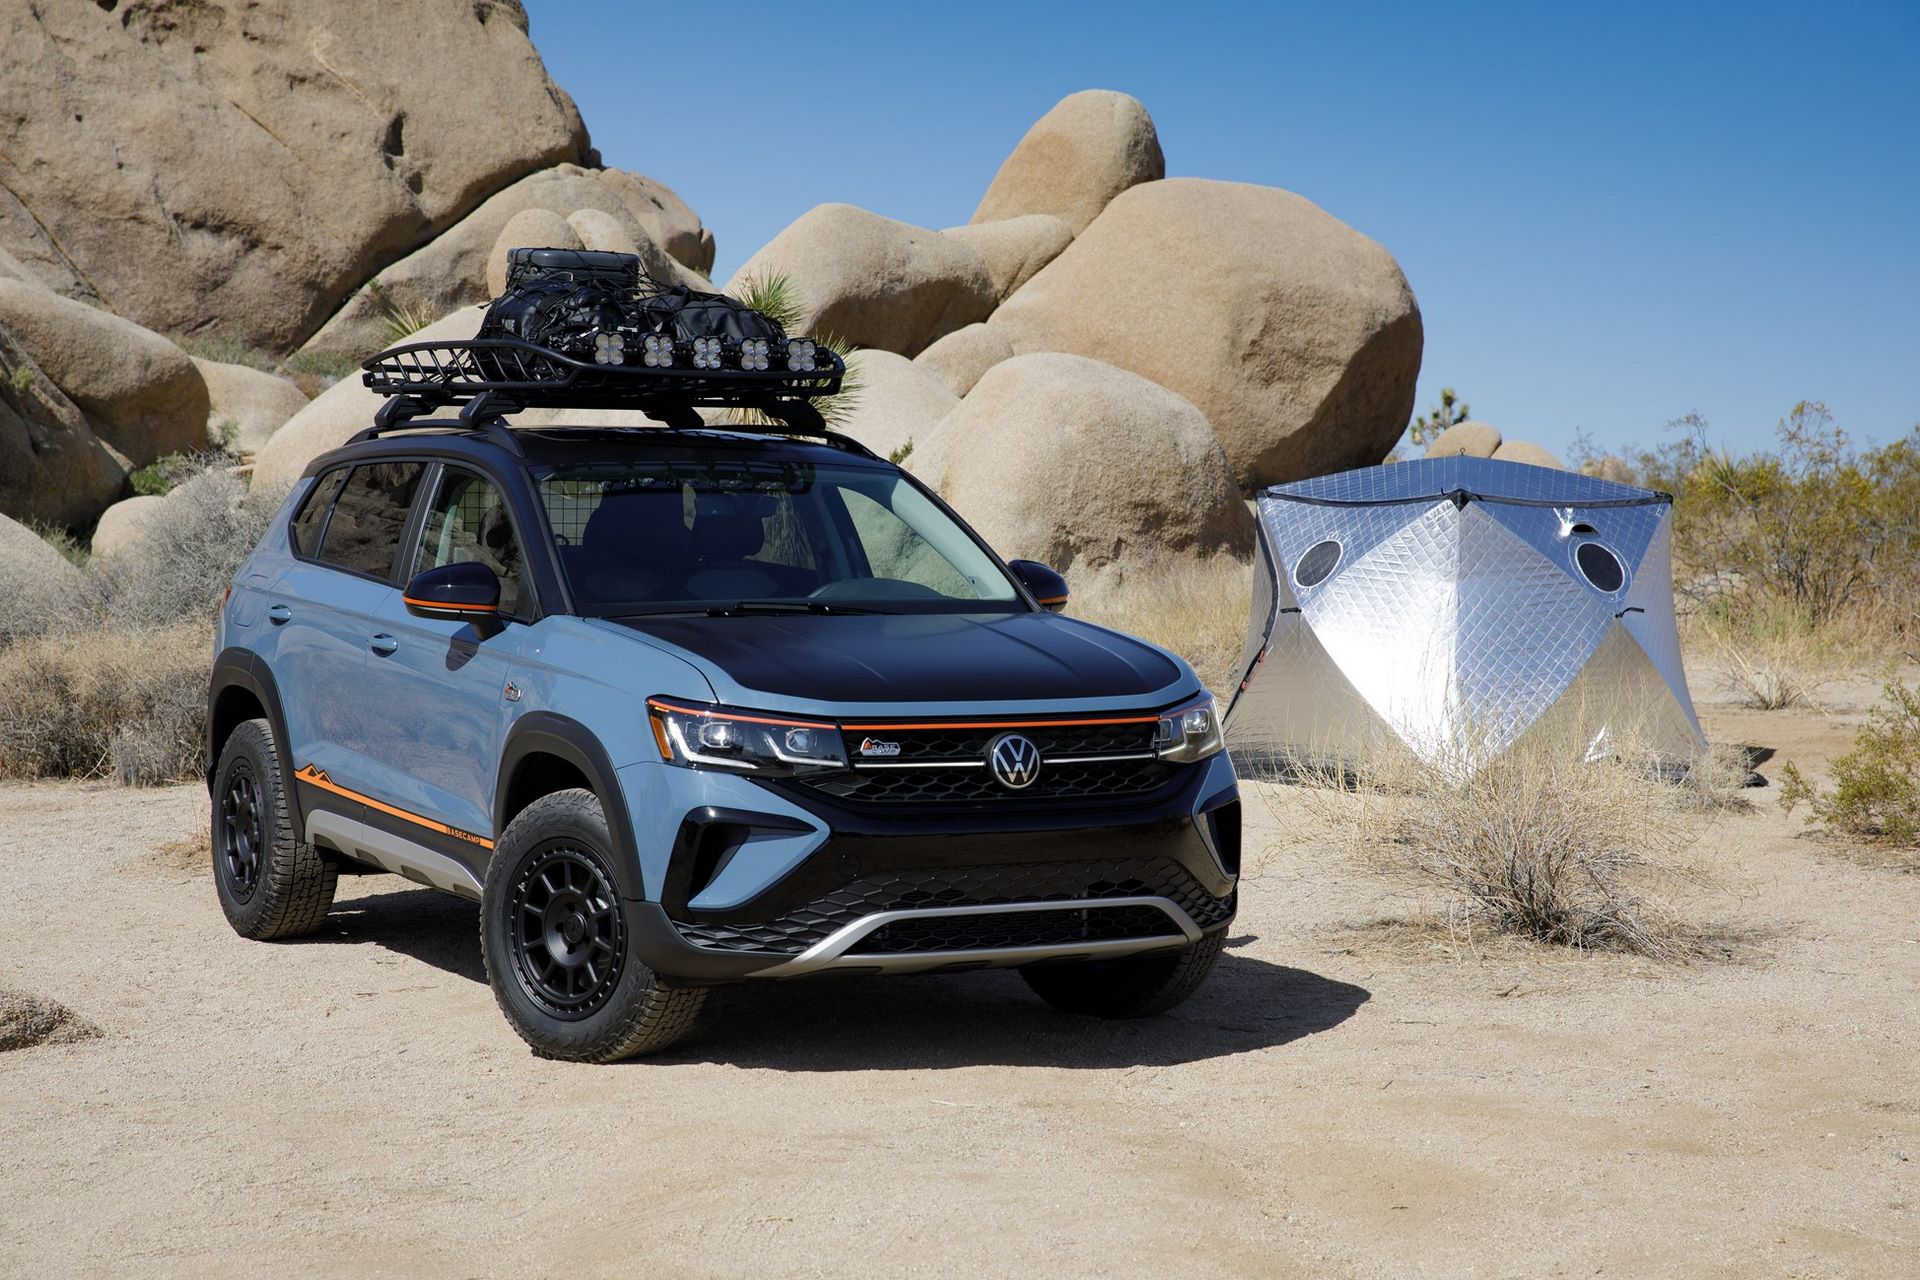 Volkswagen-Taos-Basecamp-concept-1